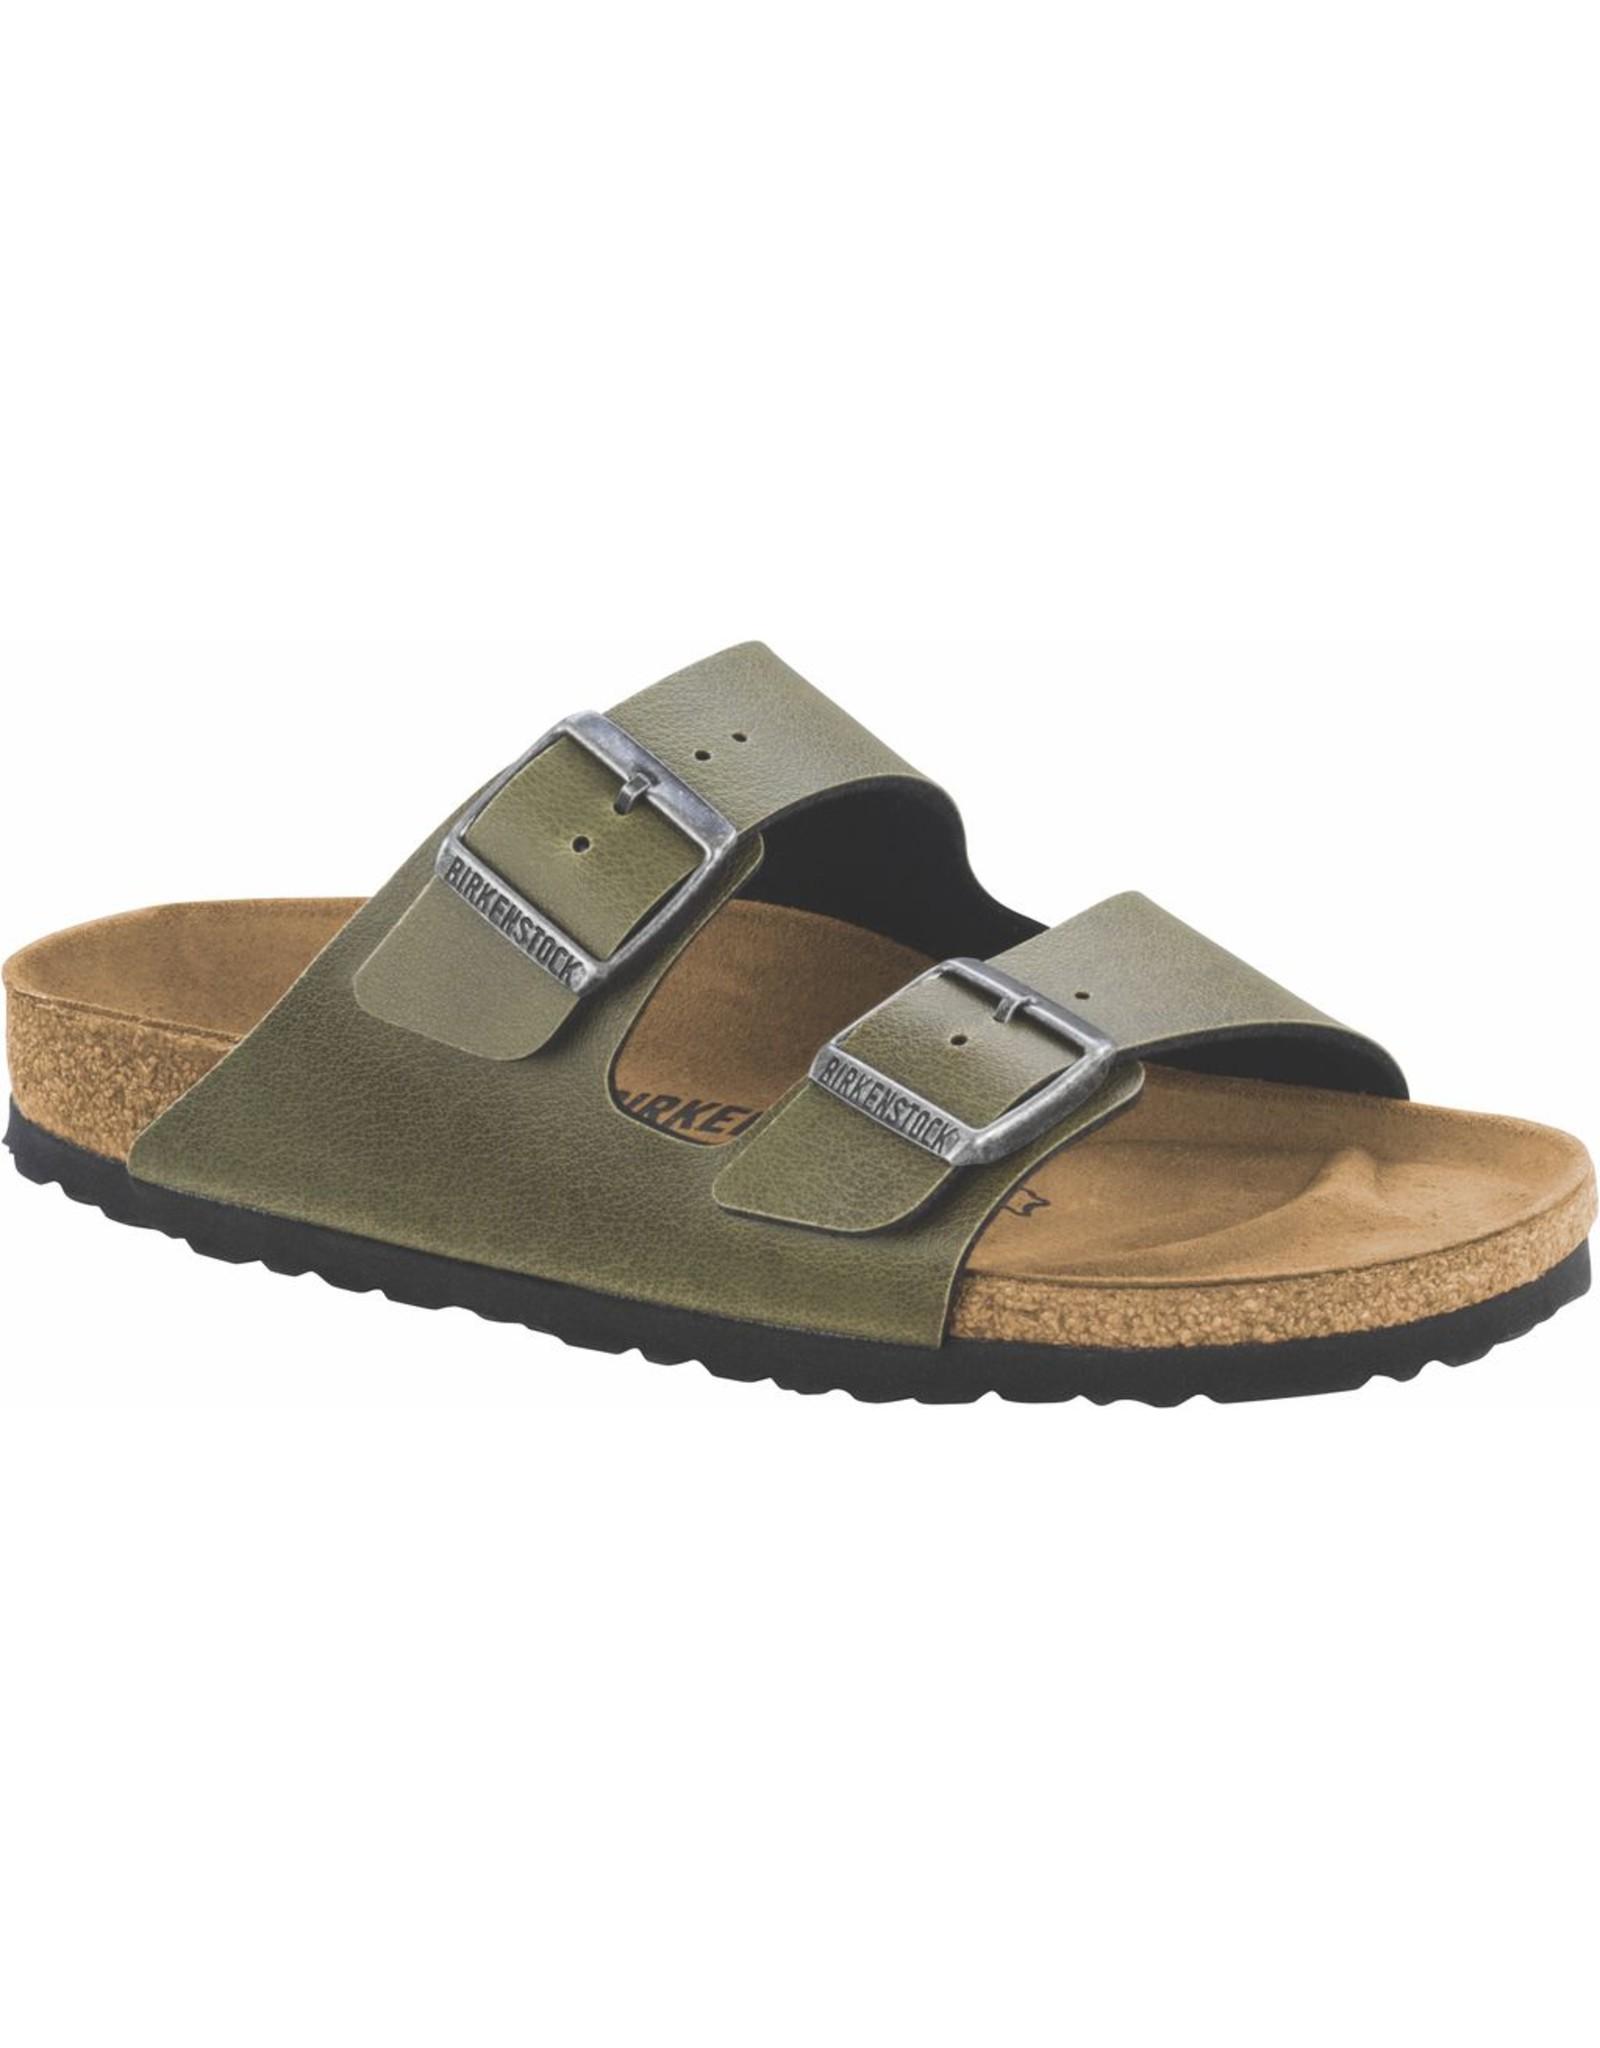 Birkenstock Arizona Olive BirkoFlor Sandal